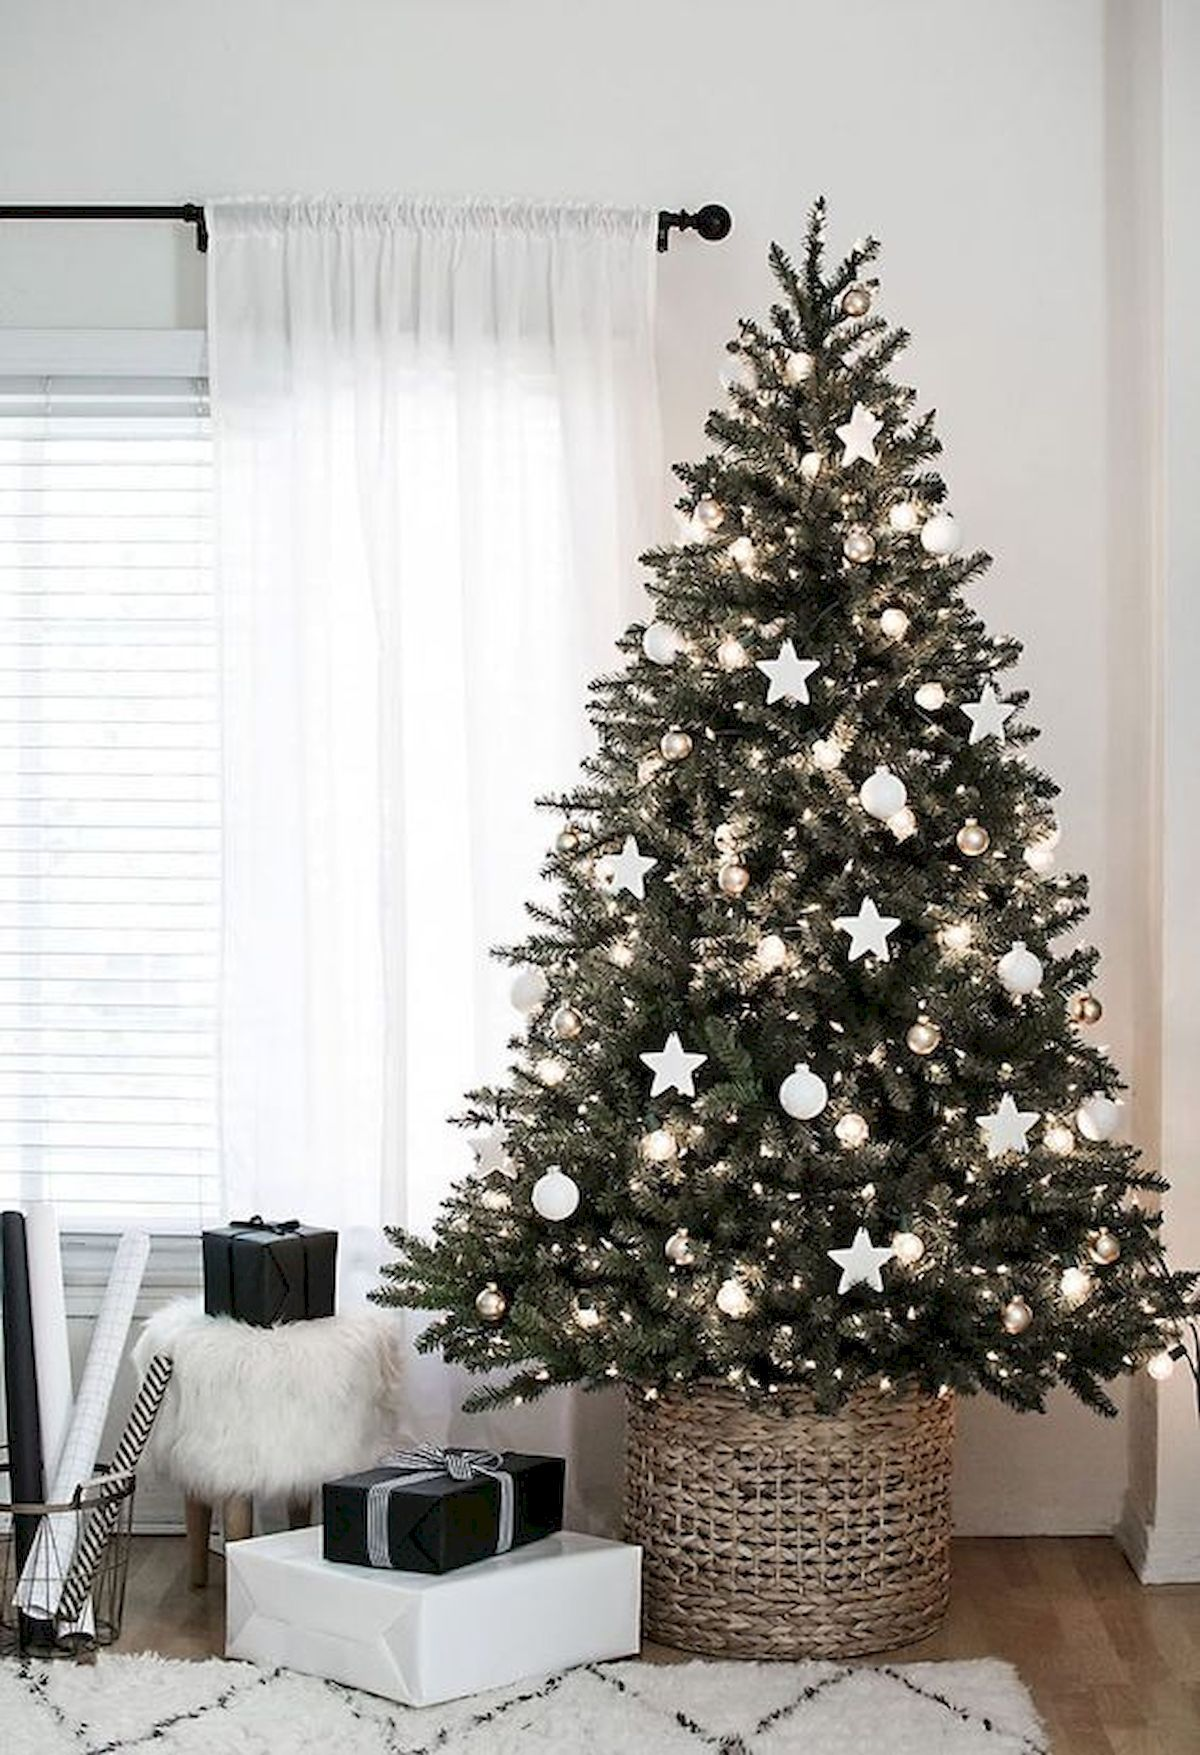 50 Best Farmhouse Christmas Tree Ideas Dekorasi Natal Natal Dekorasi Rumah